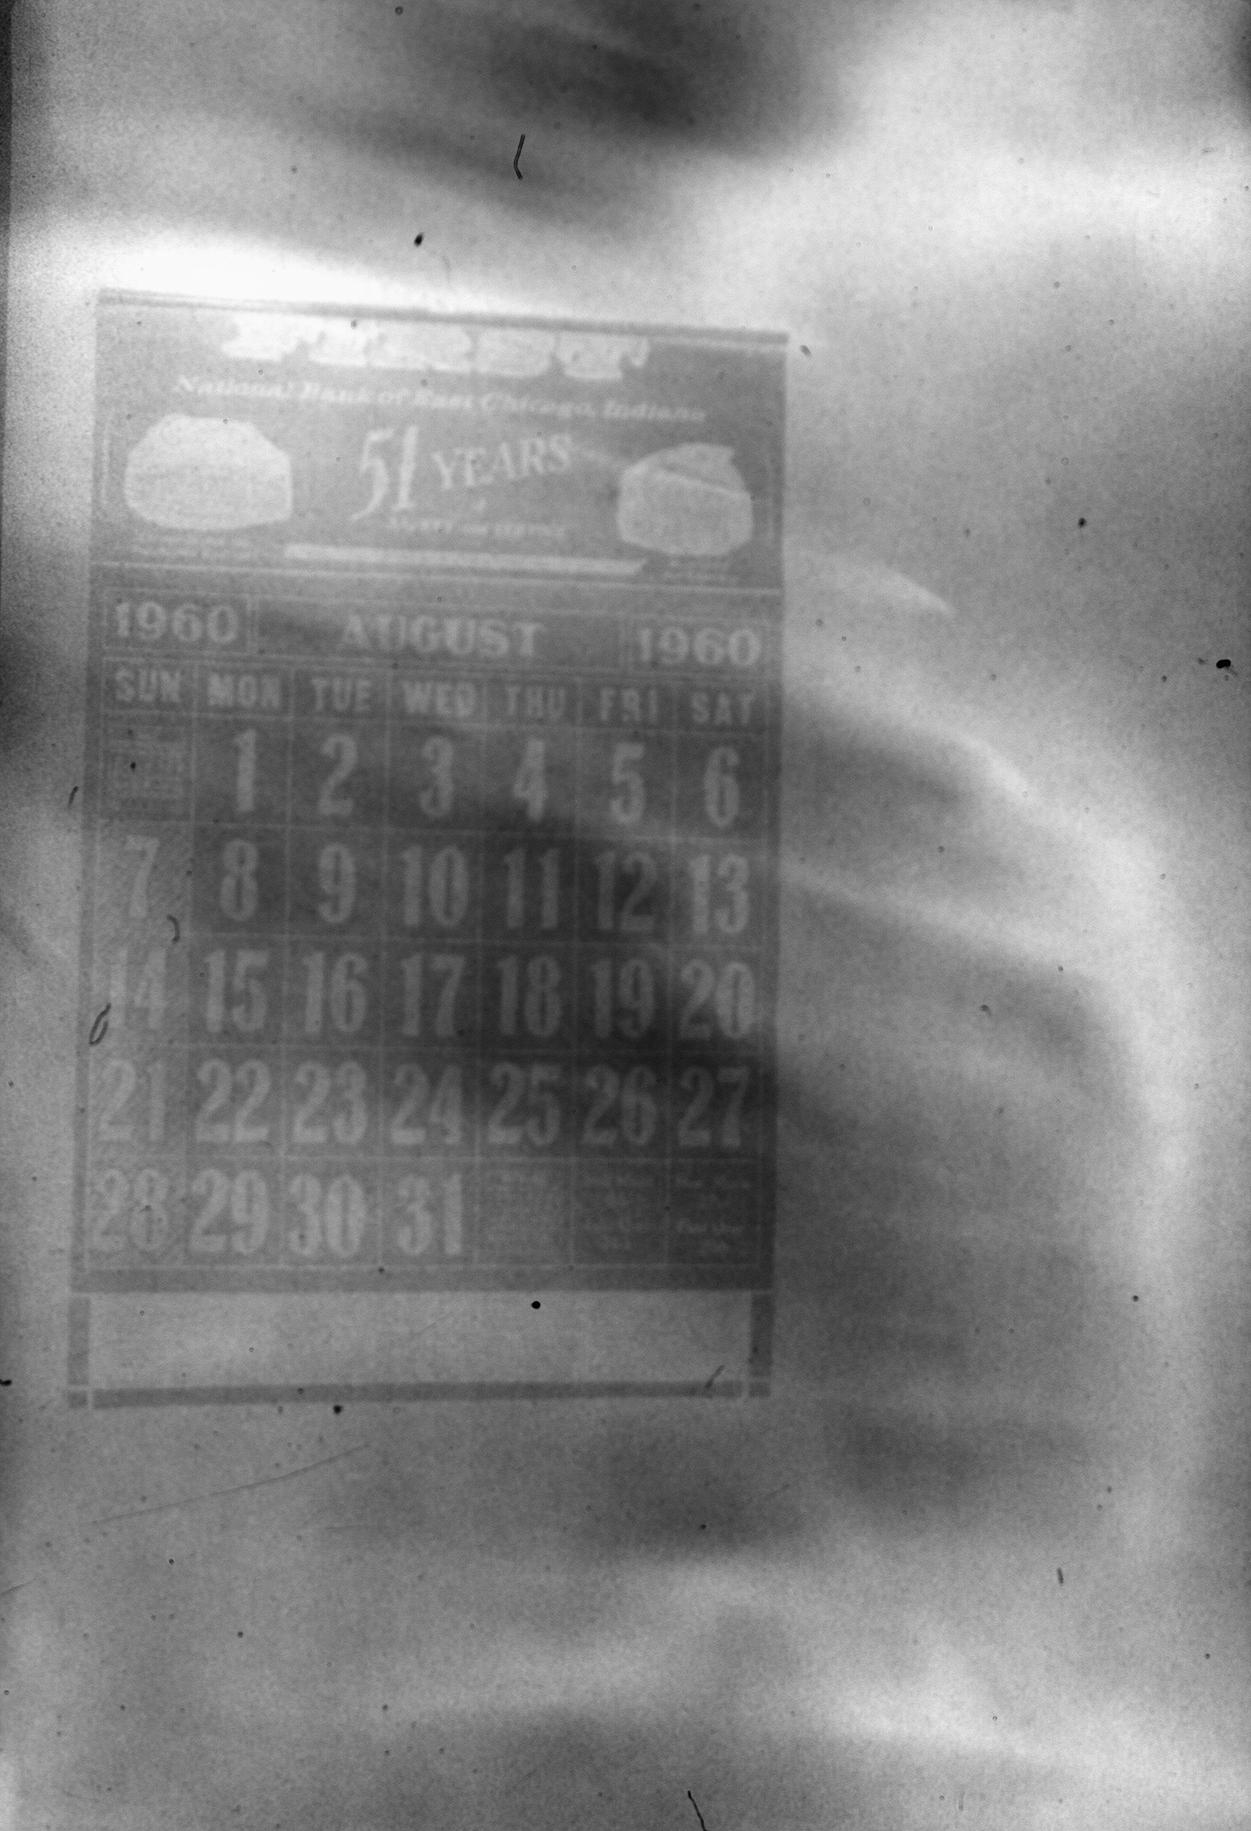 Paul Bundle 18 Roll 8 001.jpg